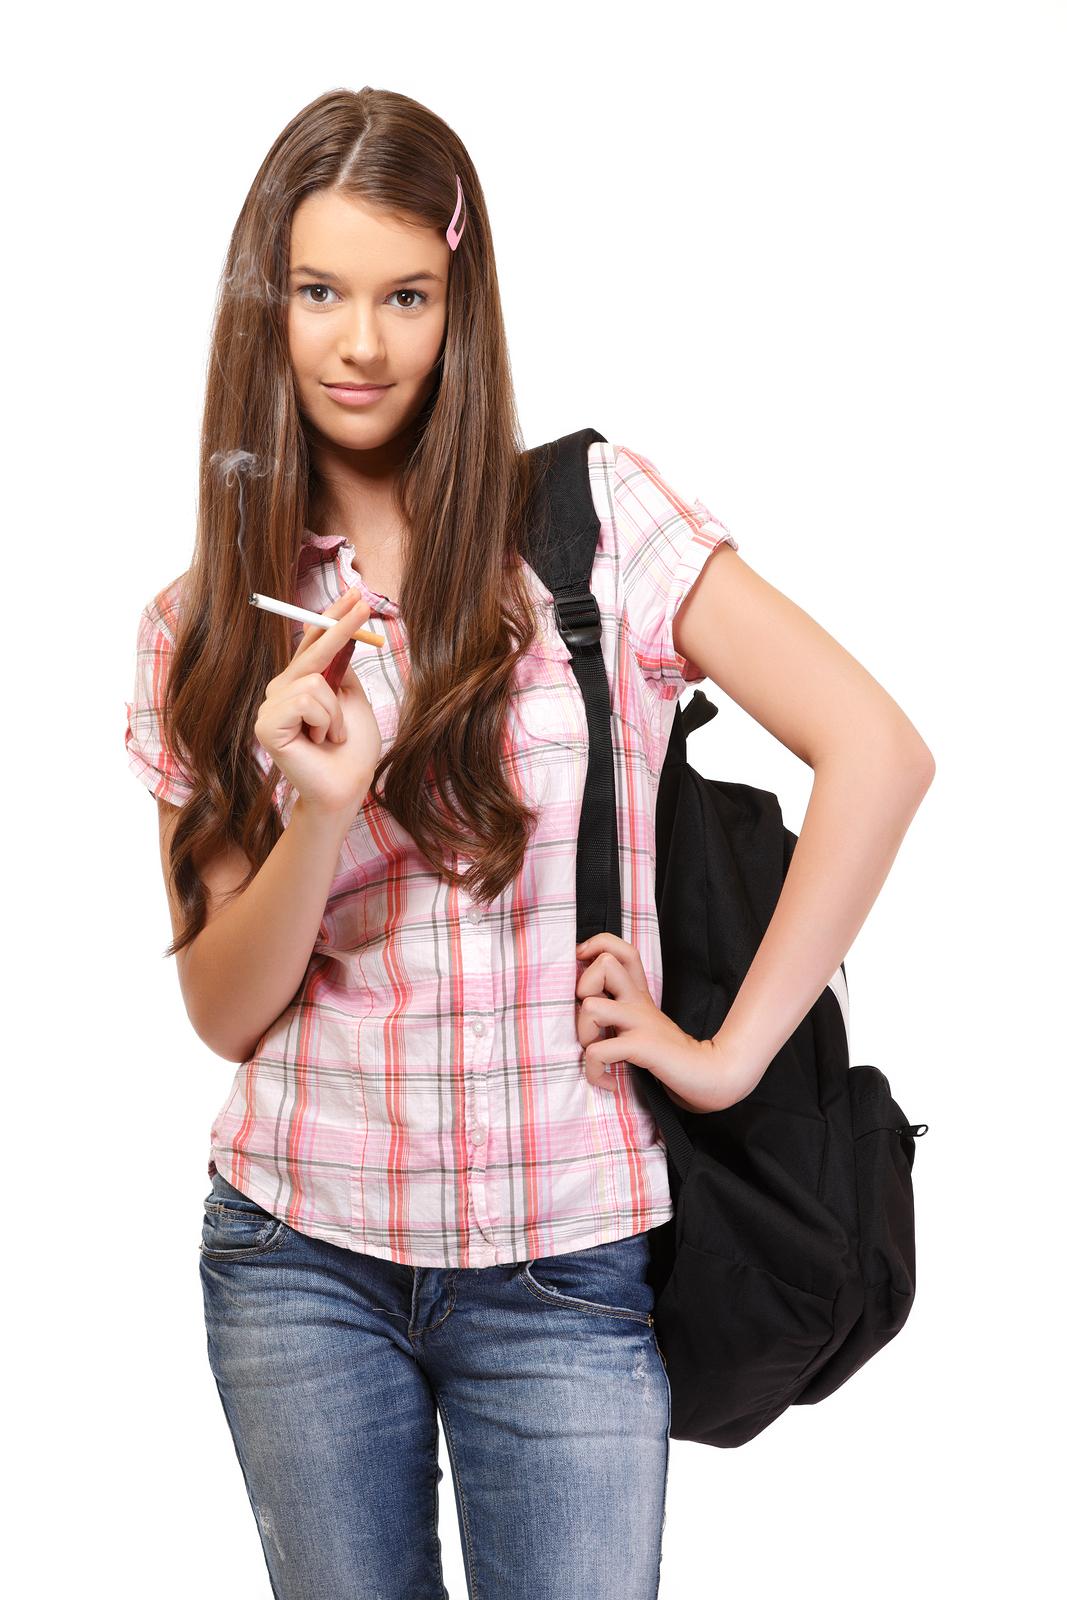 Adolescent case study